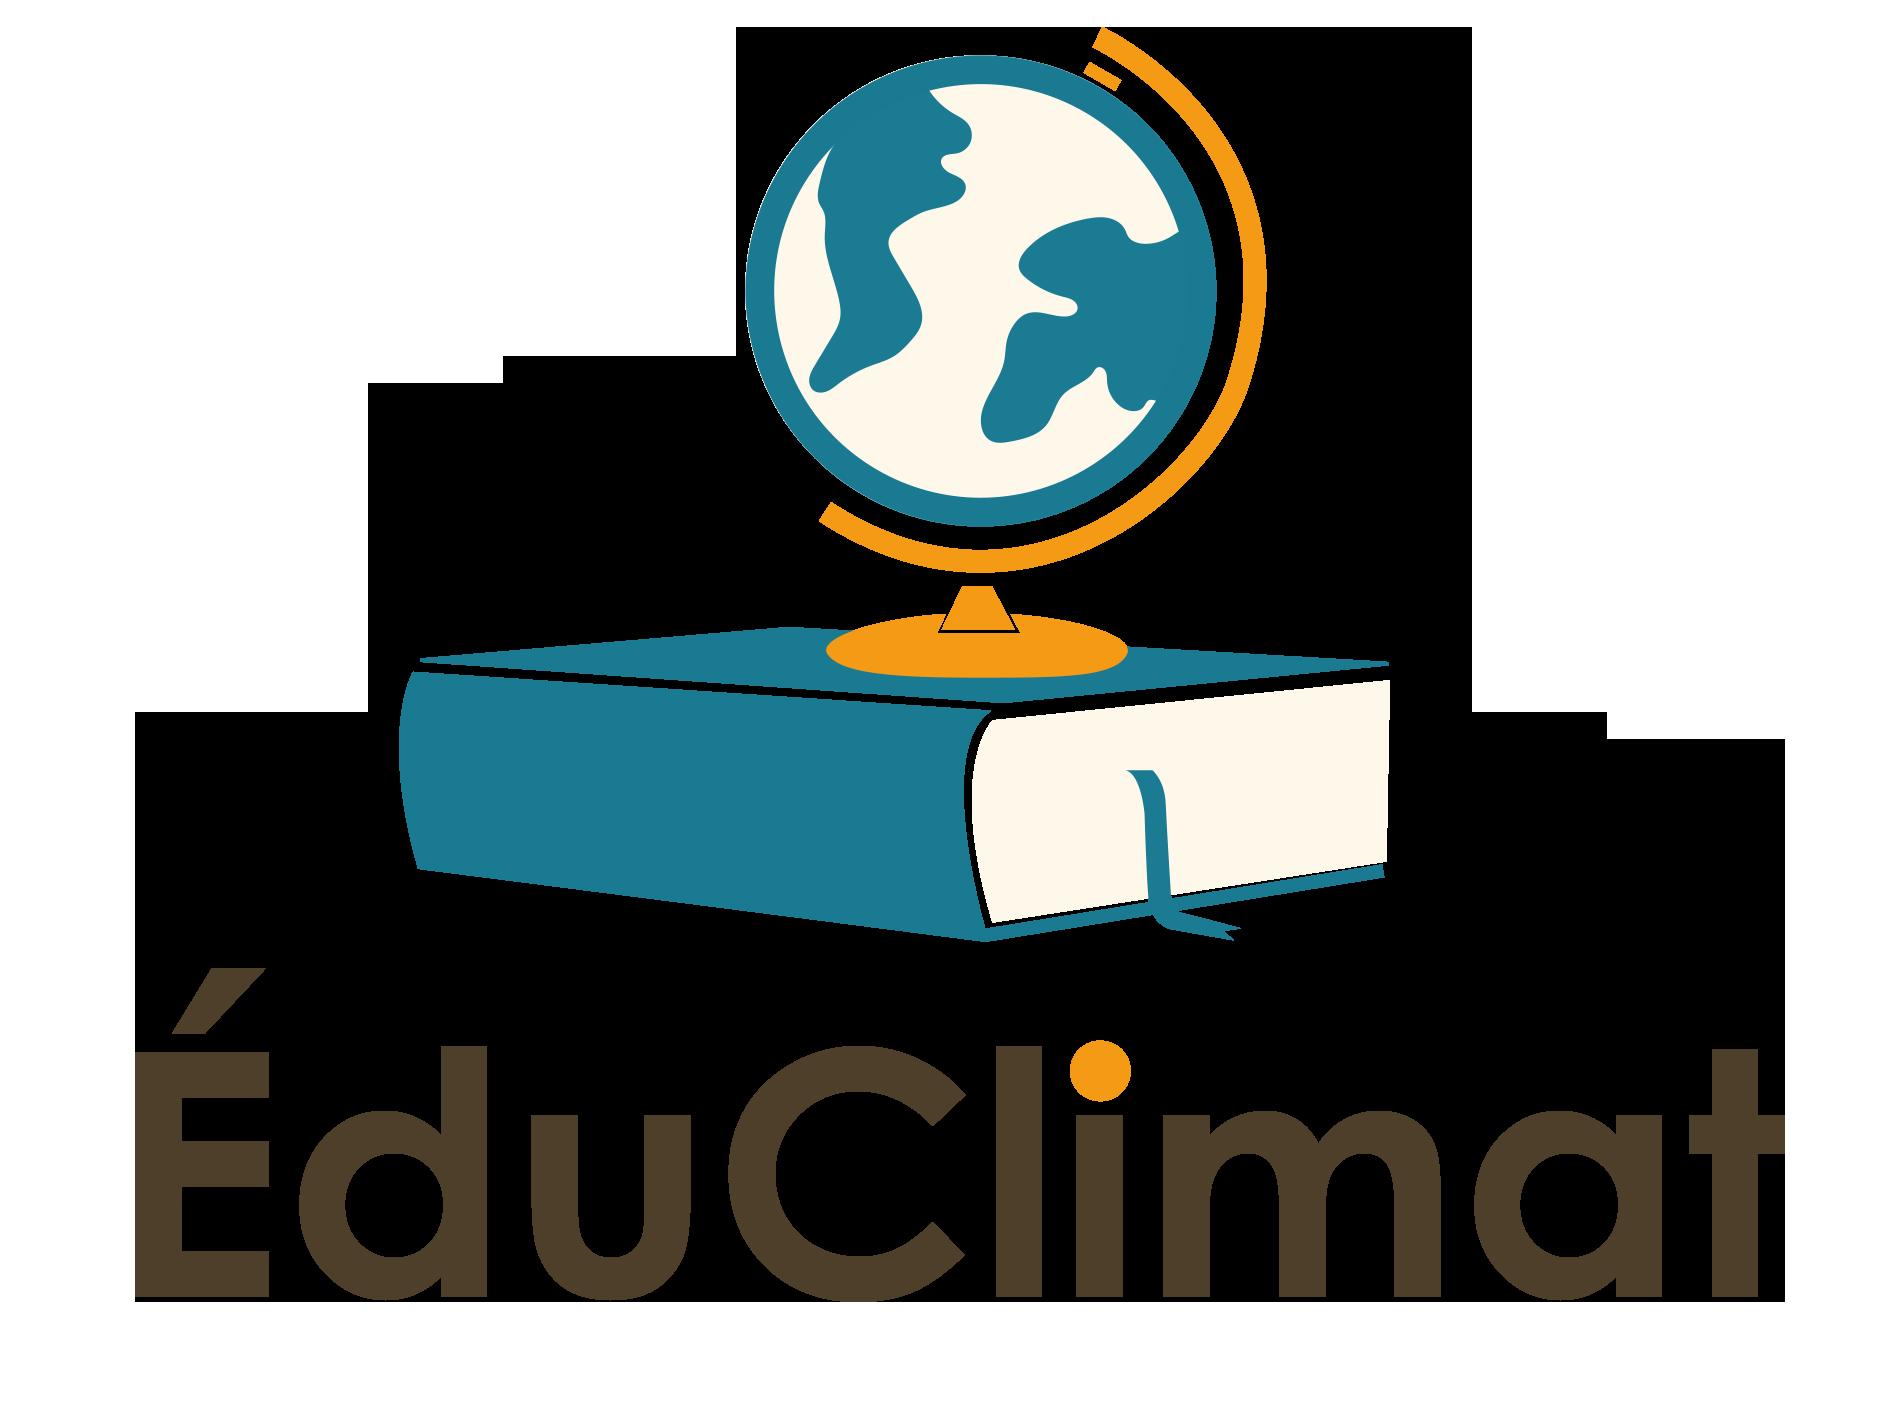 Educlimat